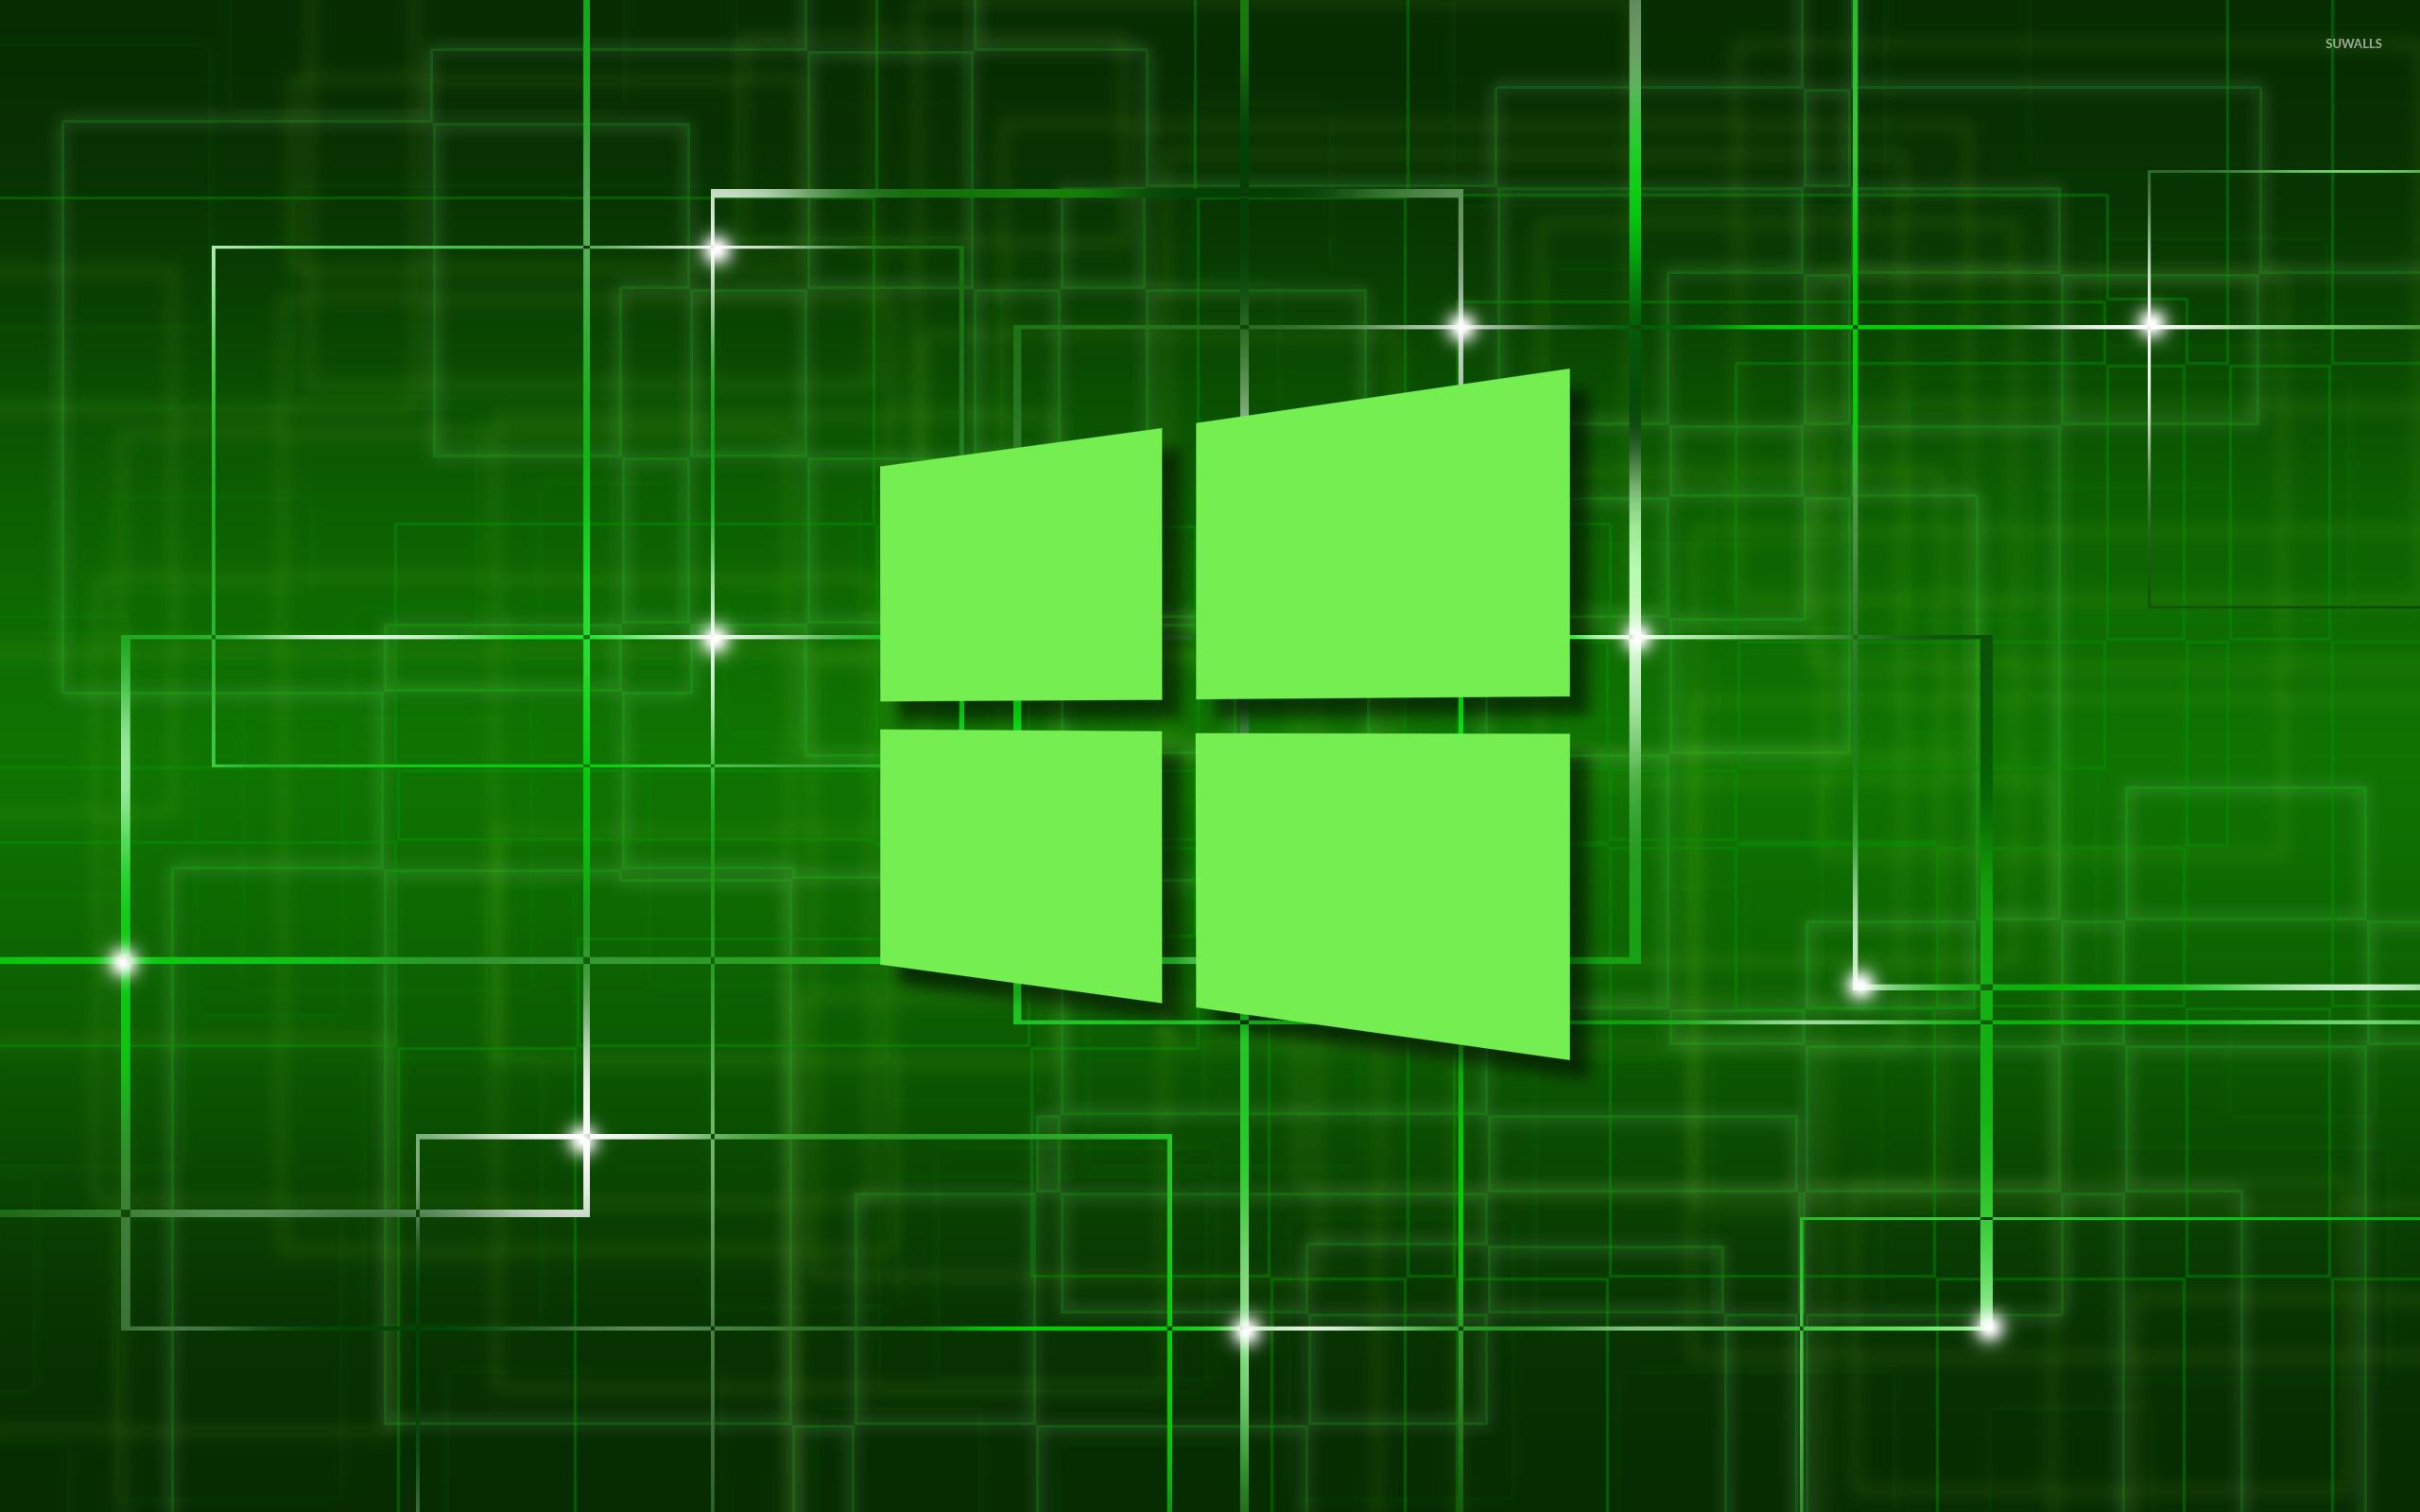 Windows 10 green simple logo on a network wallpaper - Computer ...